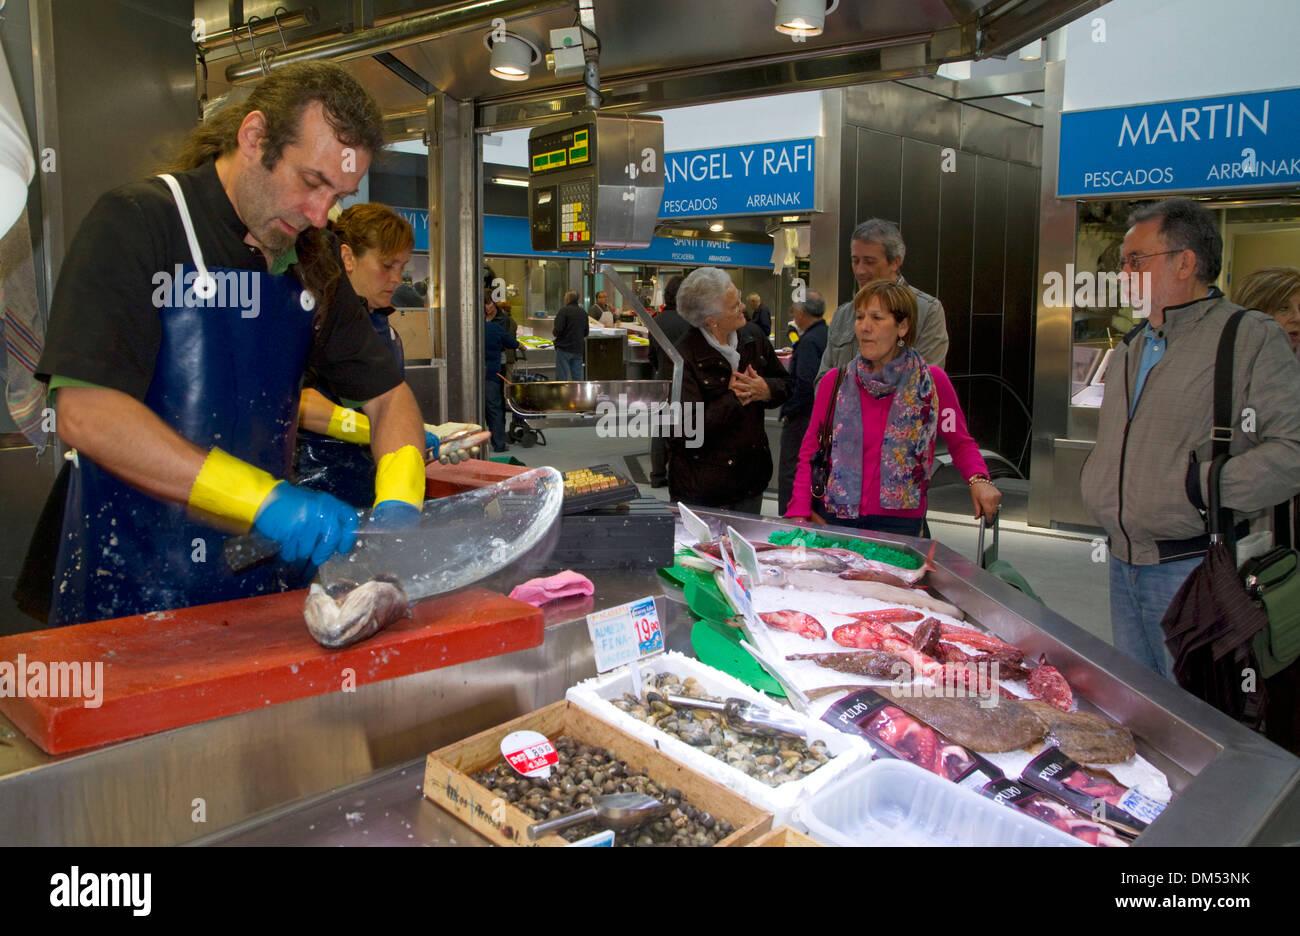 Seafood vendor at the Mercado de la Ribera along the Nervion River at Bilbao, Biscay, Spain. - Stock Image